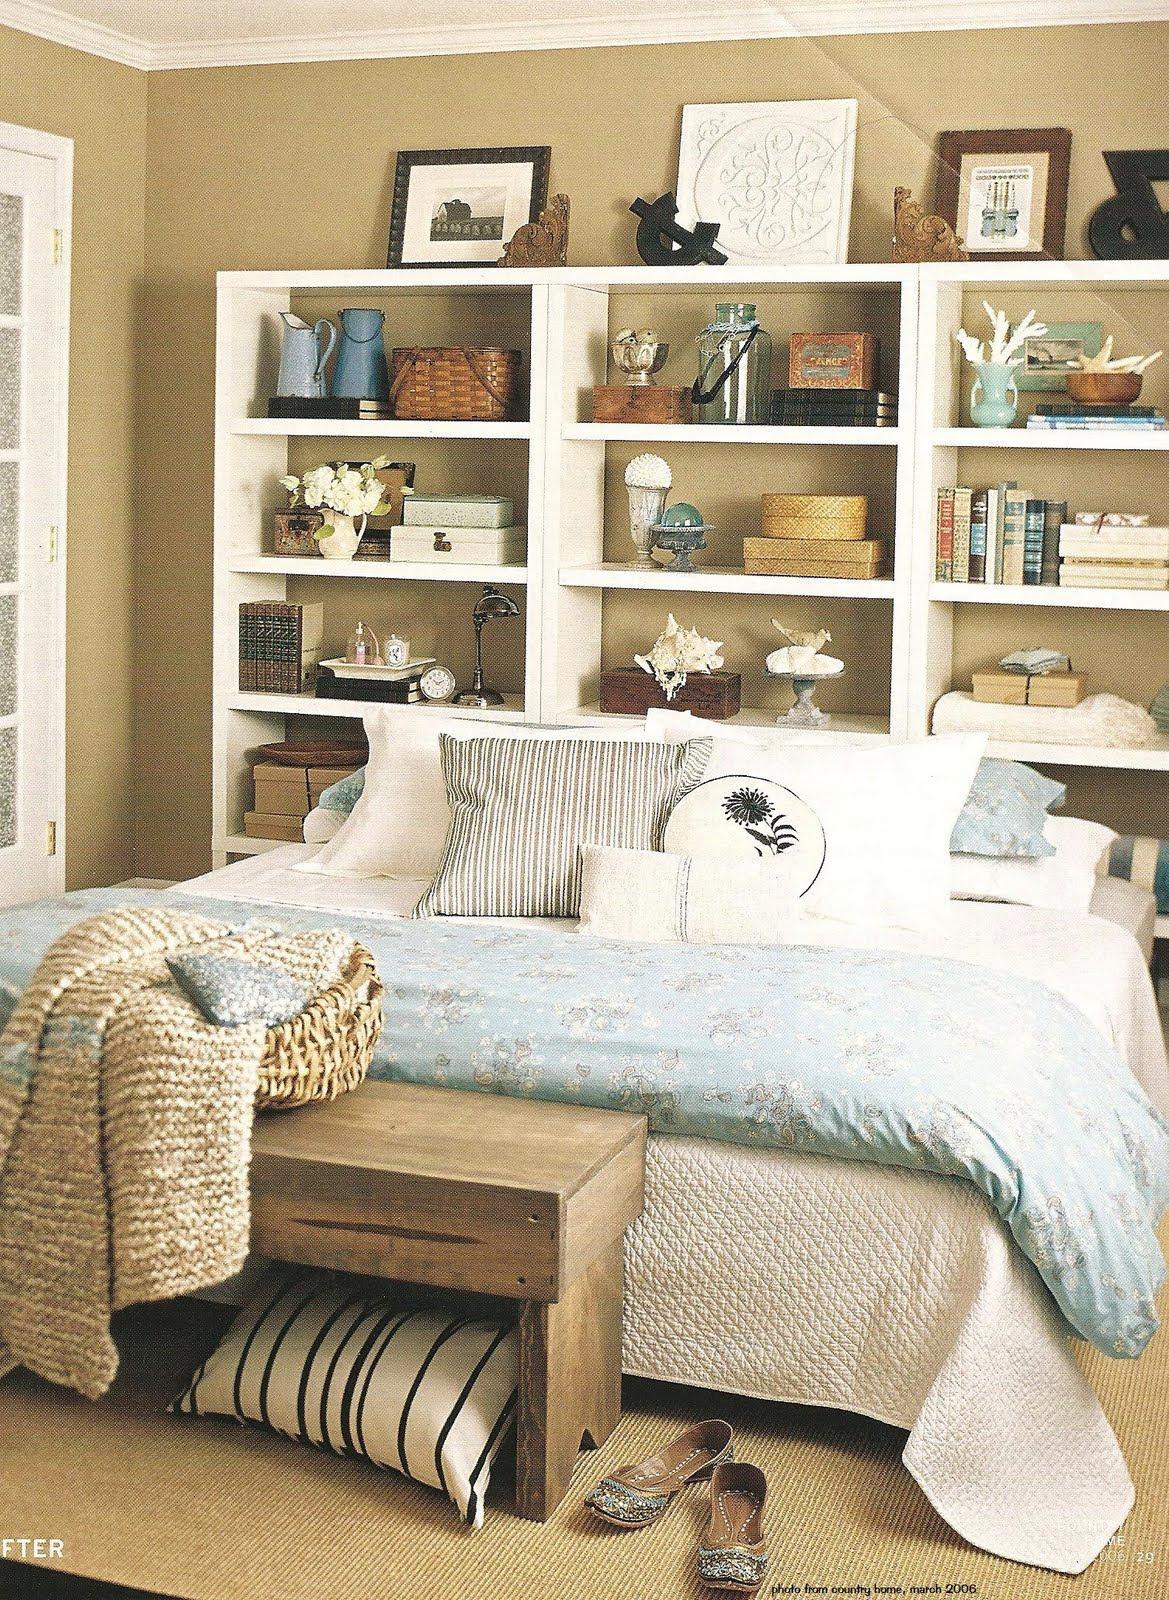 Outstanding Bedroom Ideas with Headboards at IKEA - HomesFeed